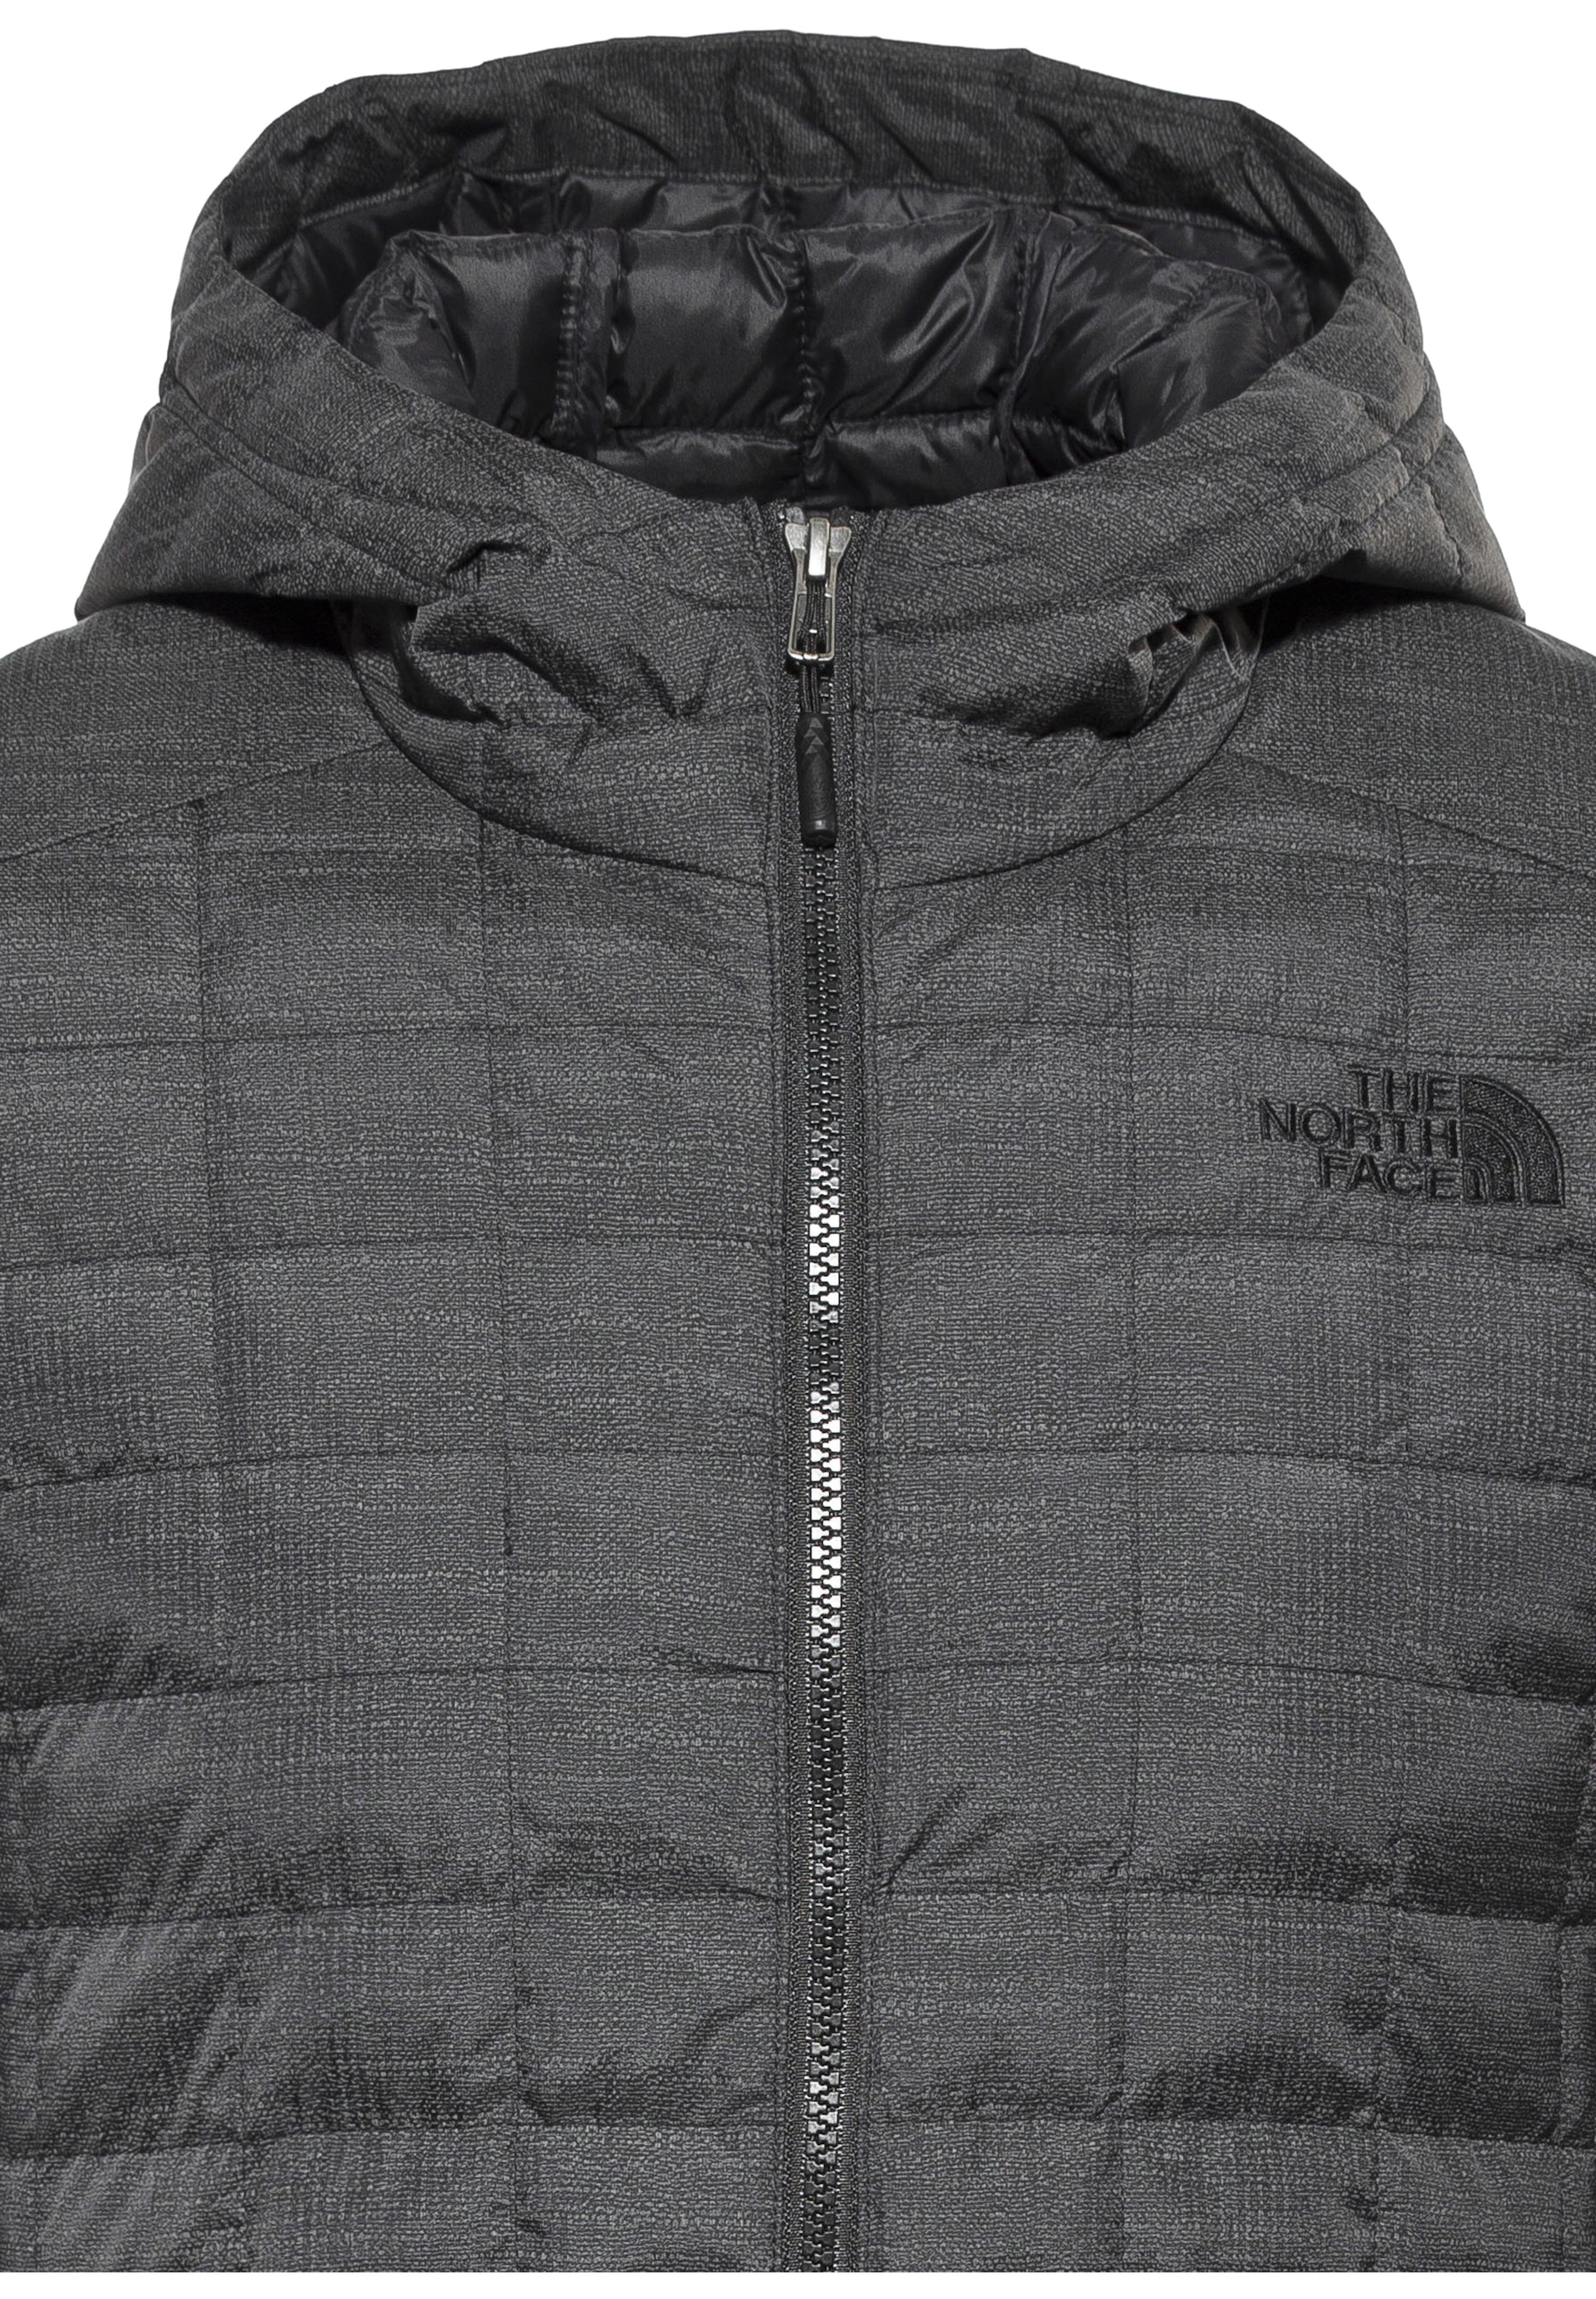 6d9fa51878ae The North Face Thermoball Gordon Lyons Jacket Men grey black at ...